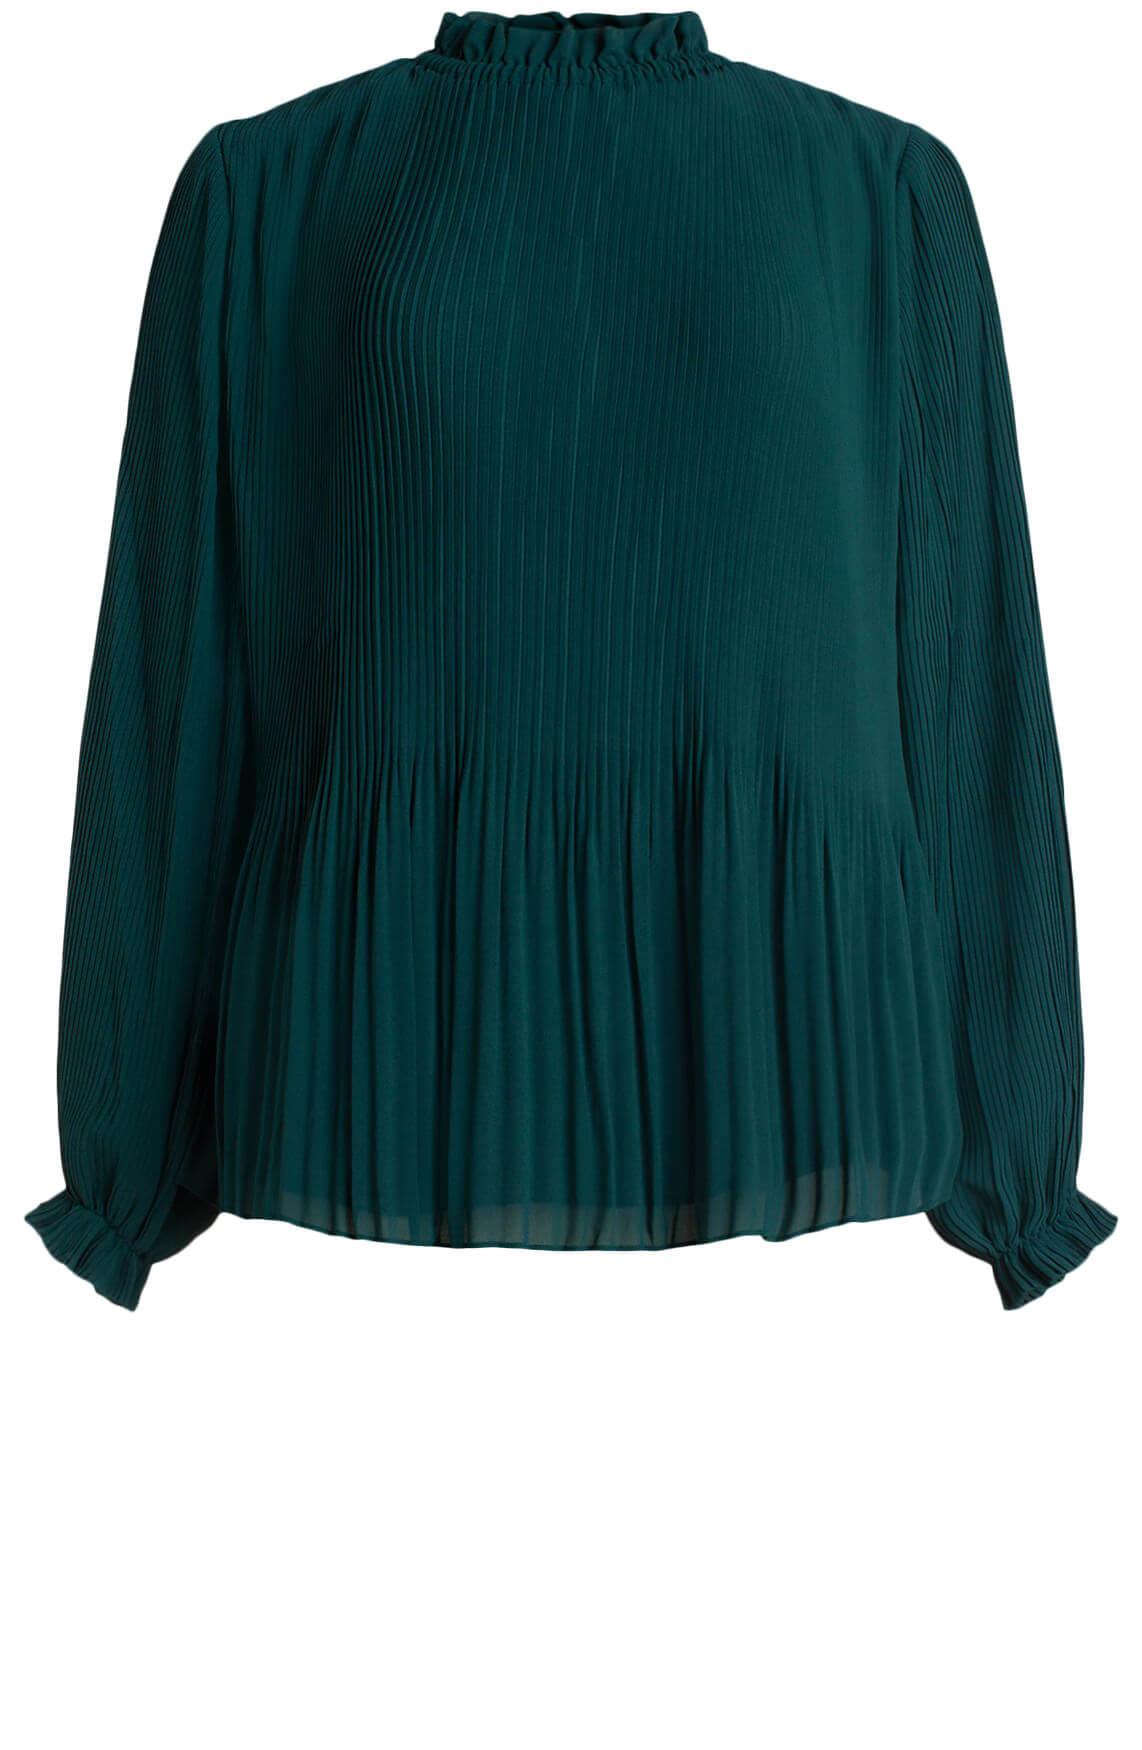 Samsoe Samsoe Dames Mindy plissé blouse groen